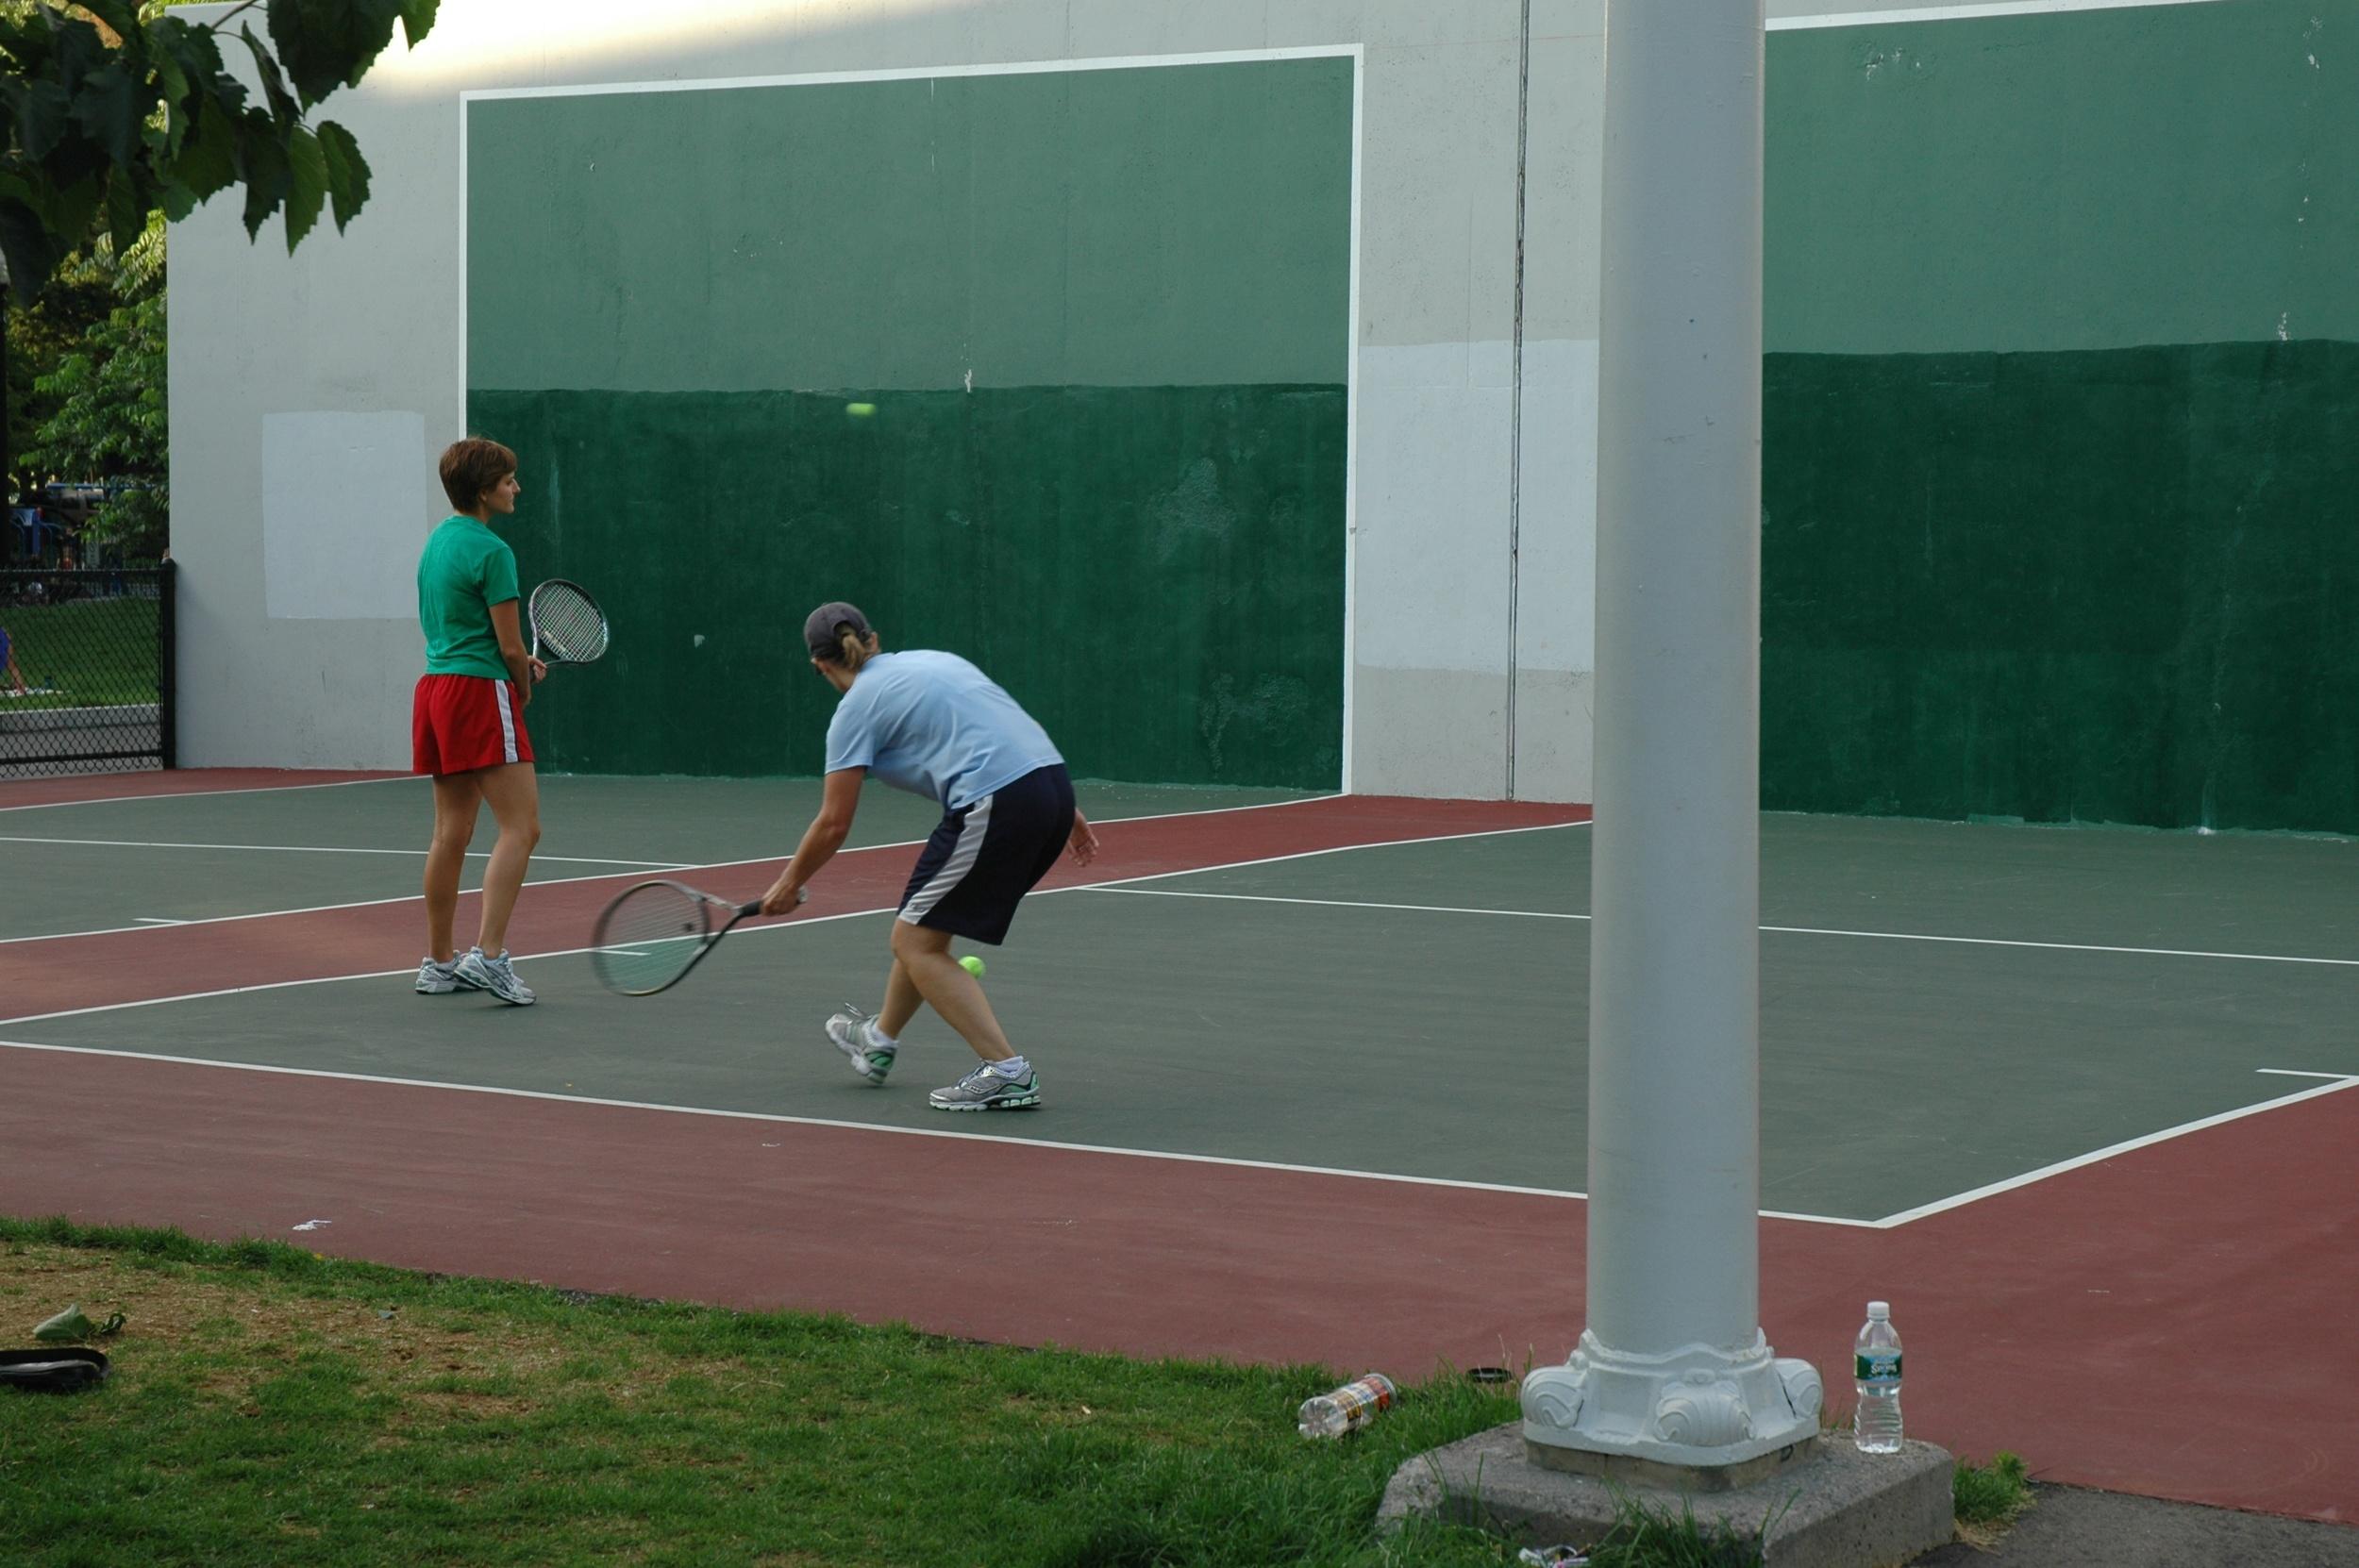 fopp_tennis_3.jpg